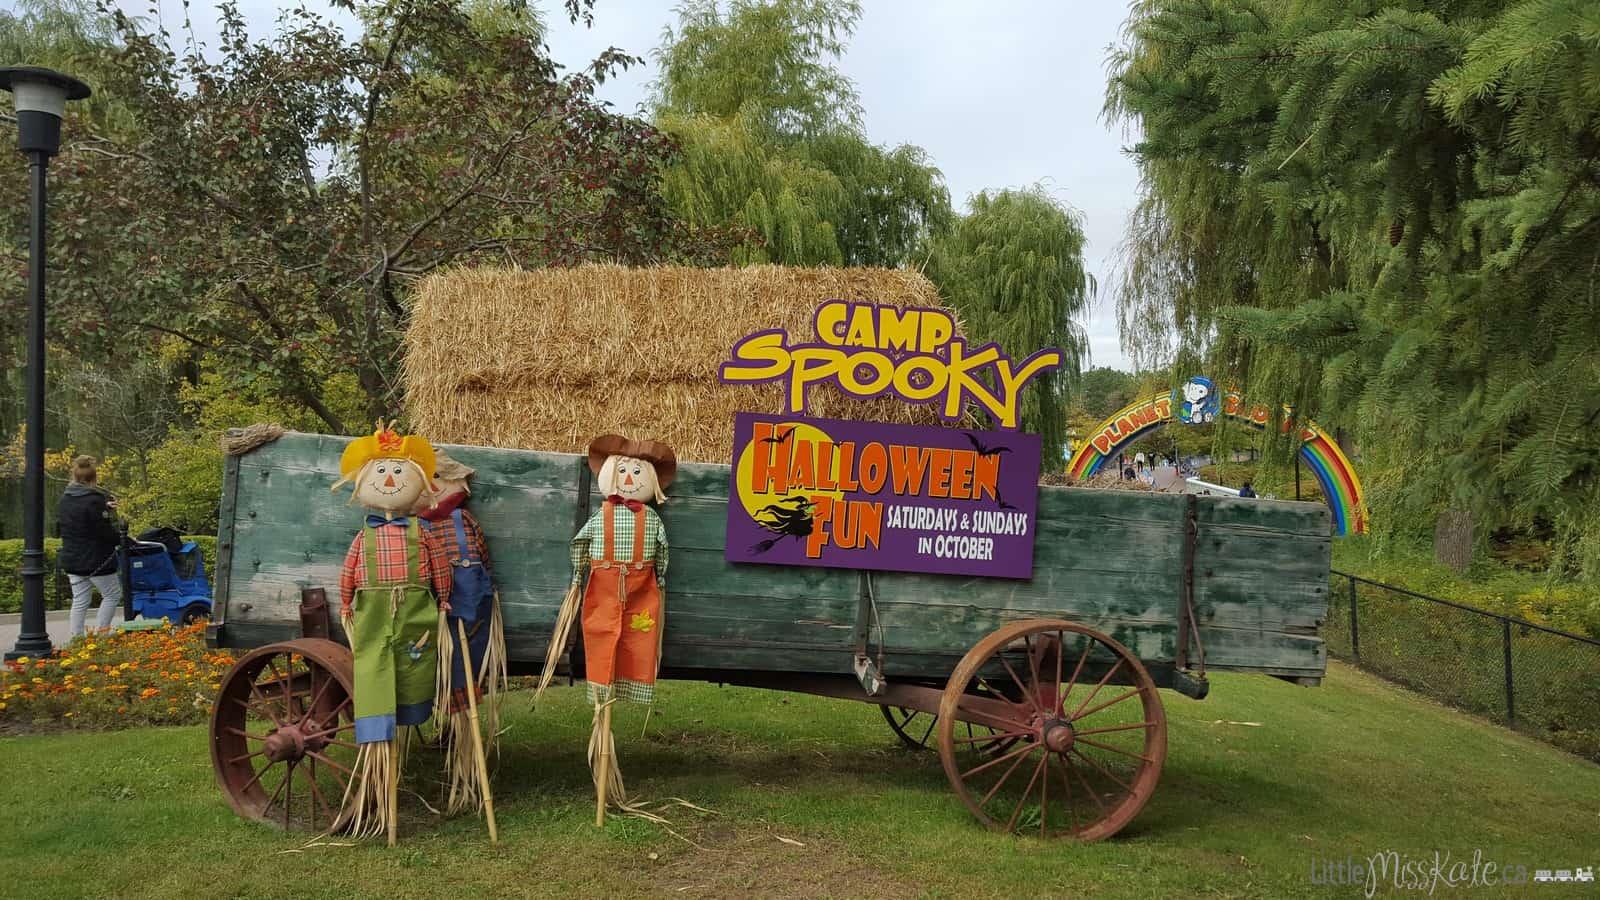 Camp spooky canadas wonderland halloween